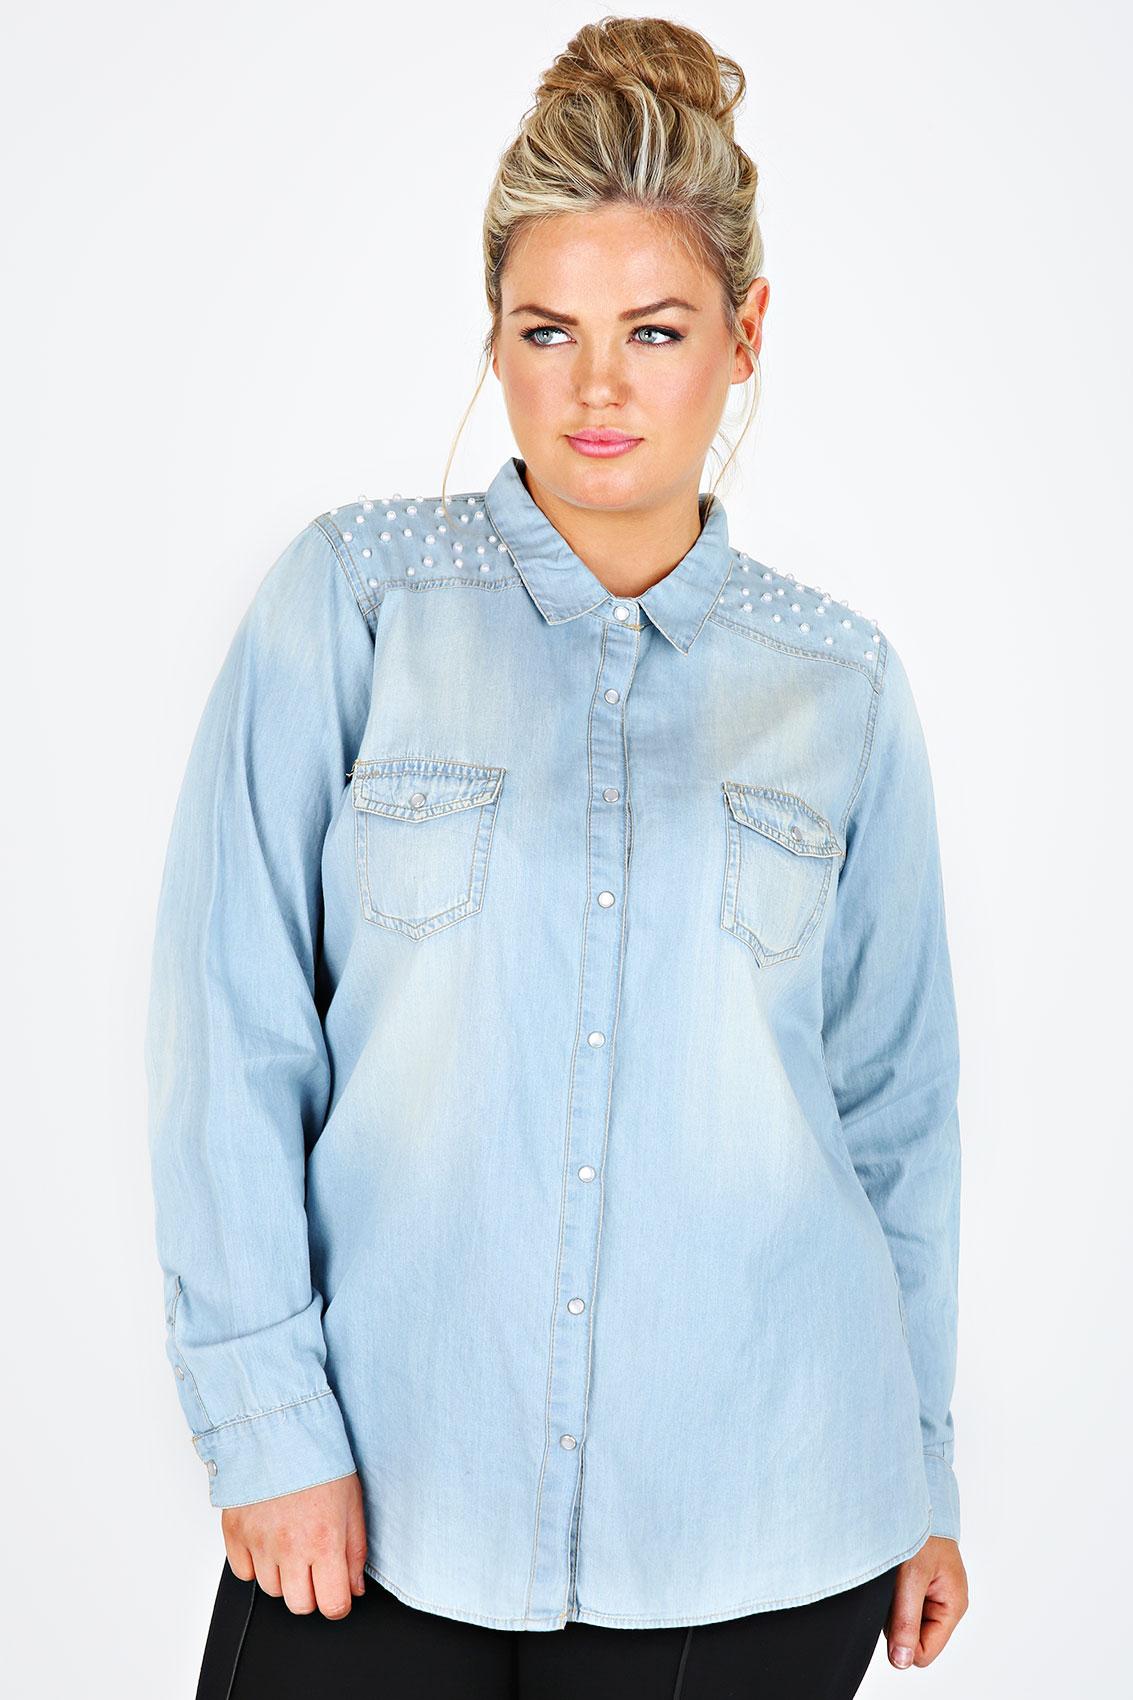 Light Blue Denim Shirt With Pearl Bead Detailing Plus